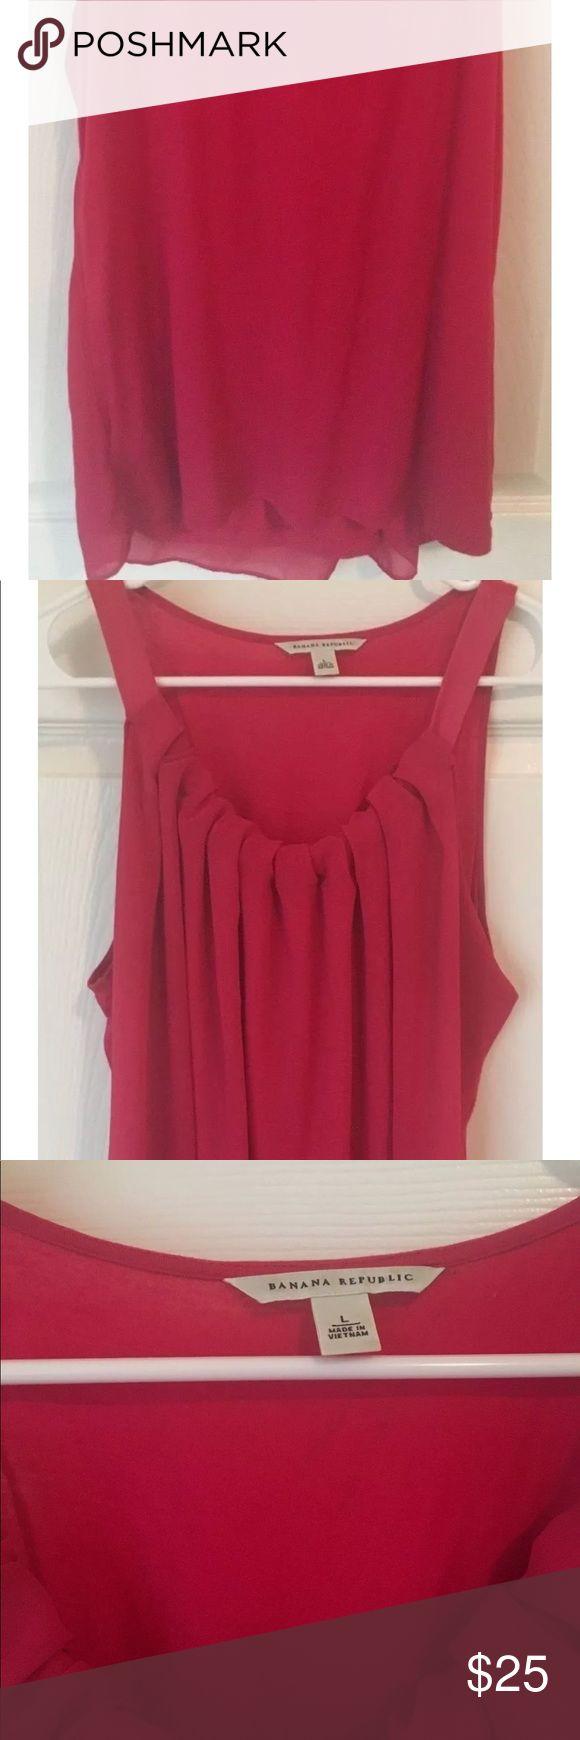 862 Best My Posh Picks Images On Pinterest American Fl Torch Tshirt Women Pink Fuchsia L Womens Banana Republic Top Size